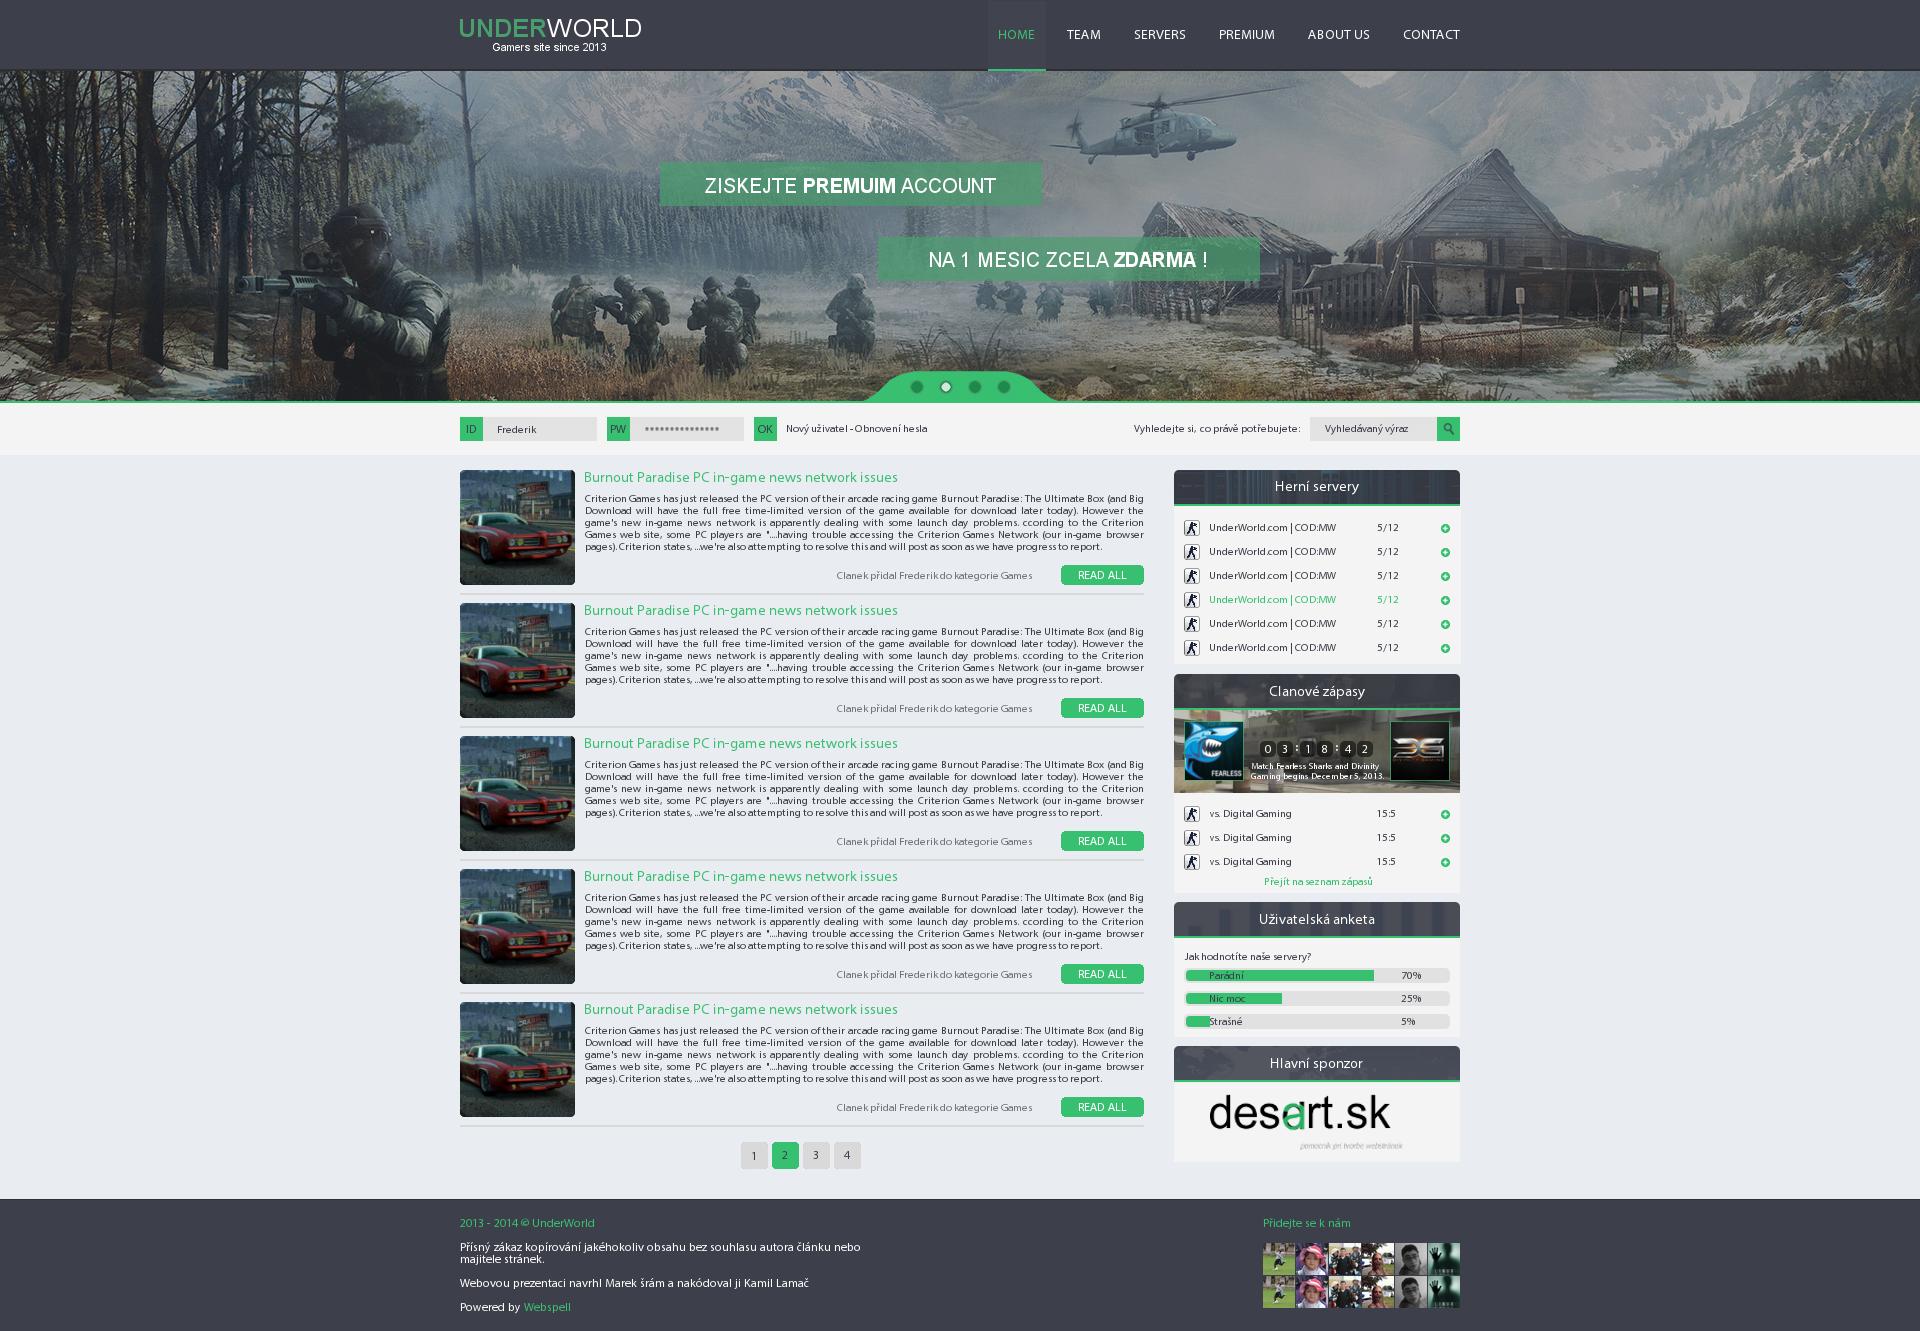 UnderWorld Flat Gaming Webdesign by jeffrey-cz on DeviantArt